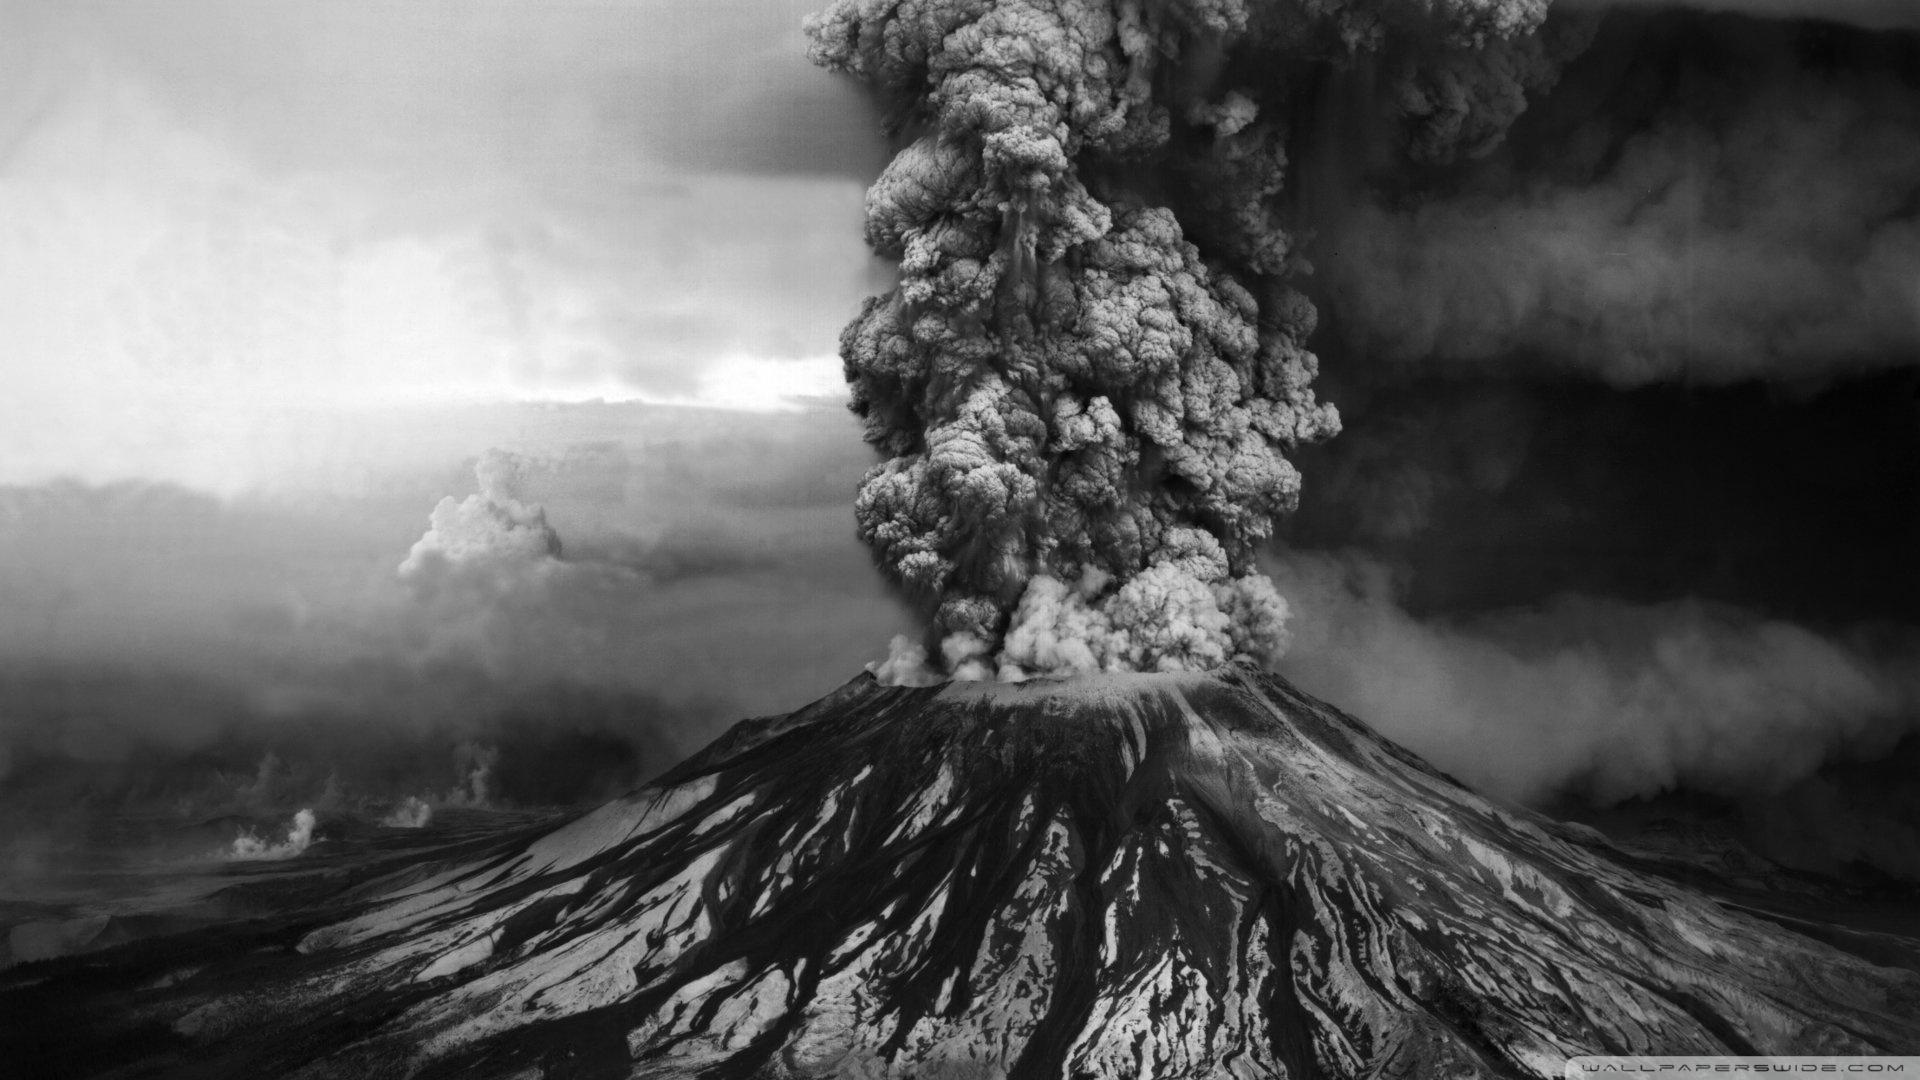 Volcanic Eruption Wallpaper 1920x1080 Volcanic Eruption 1920x1080